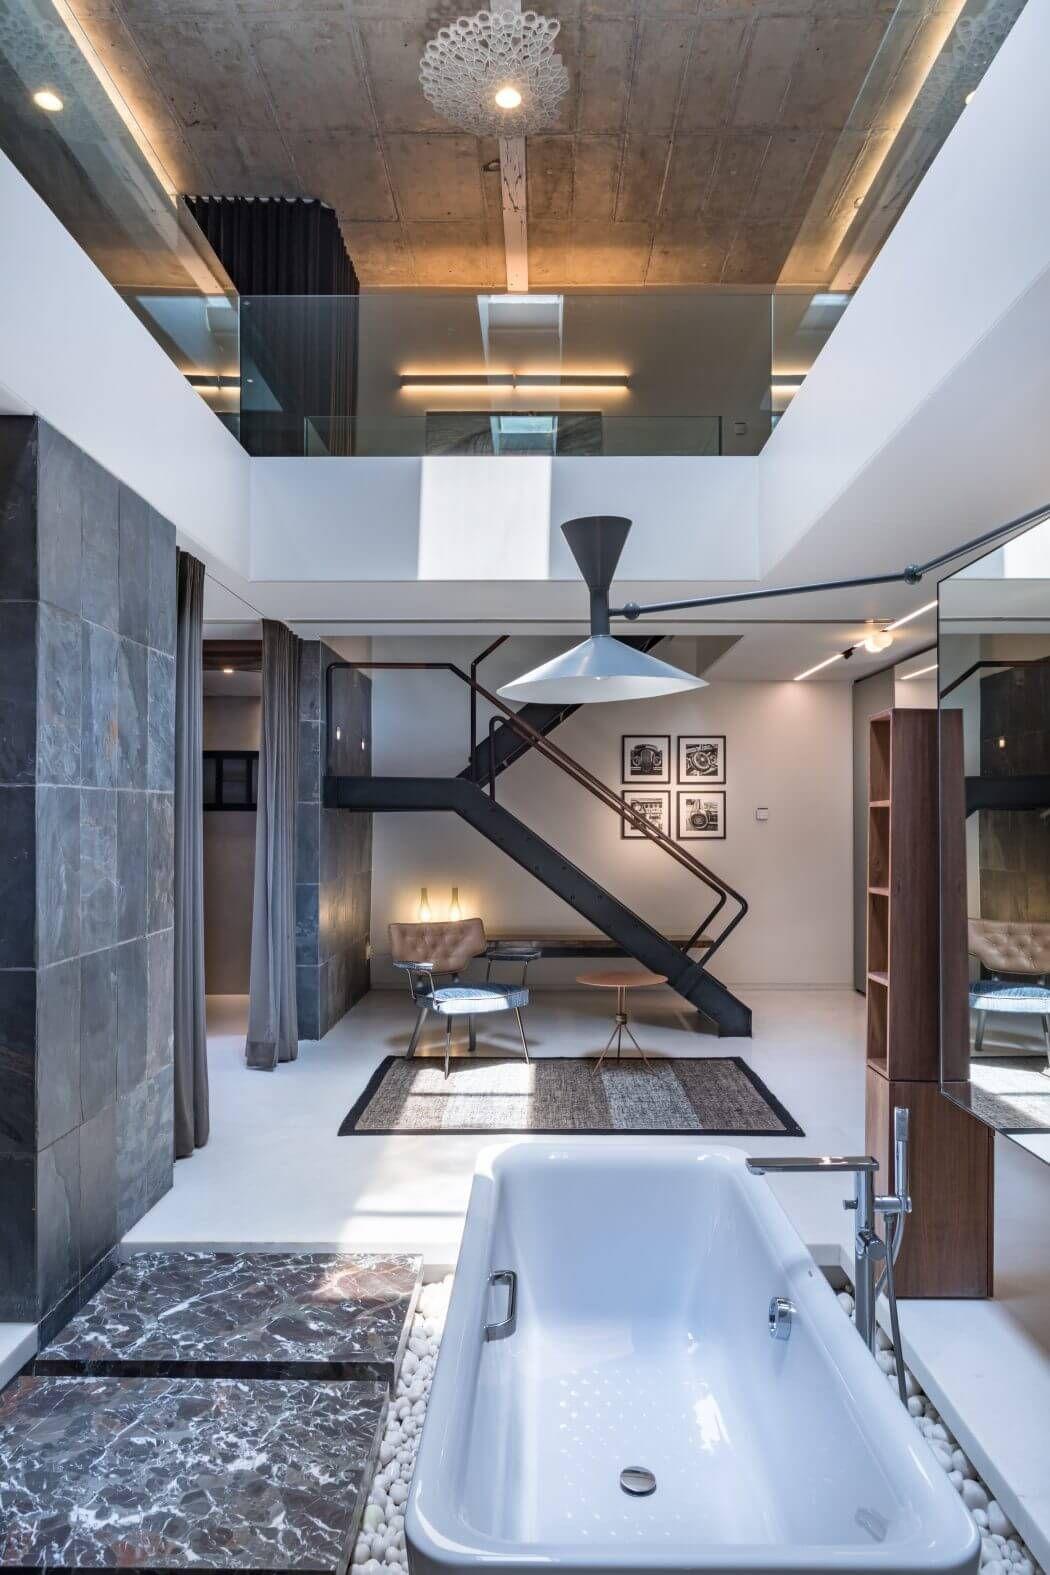 Villa 430 by MORIQ | Villas, Interiors and Modern stairs